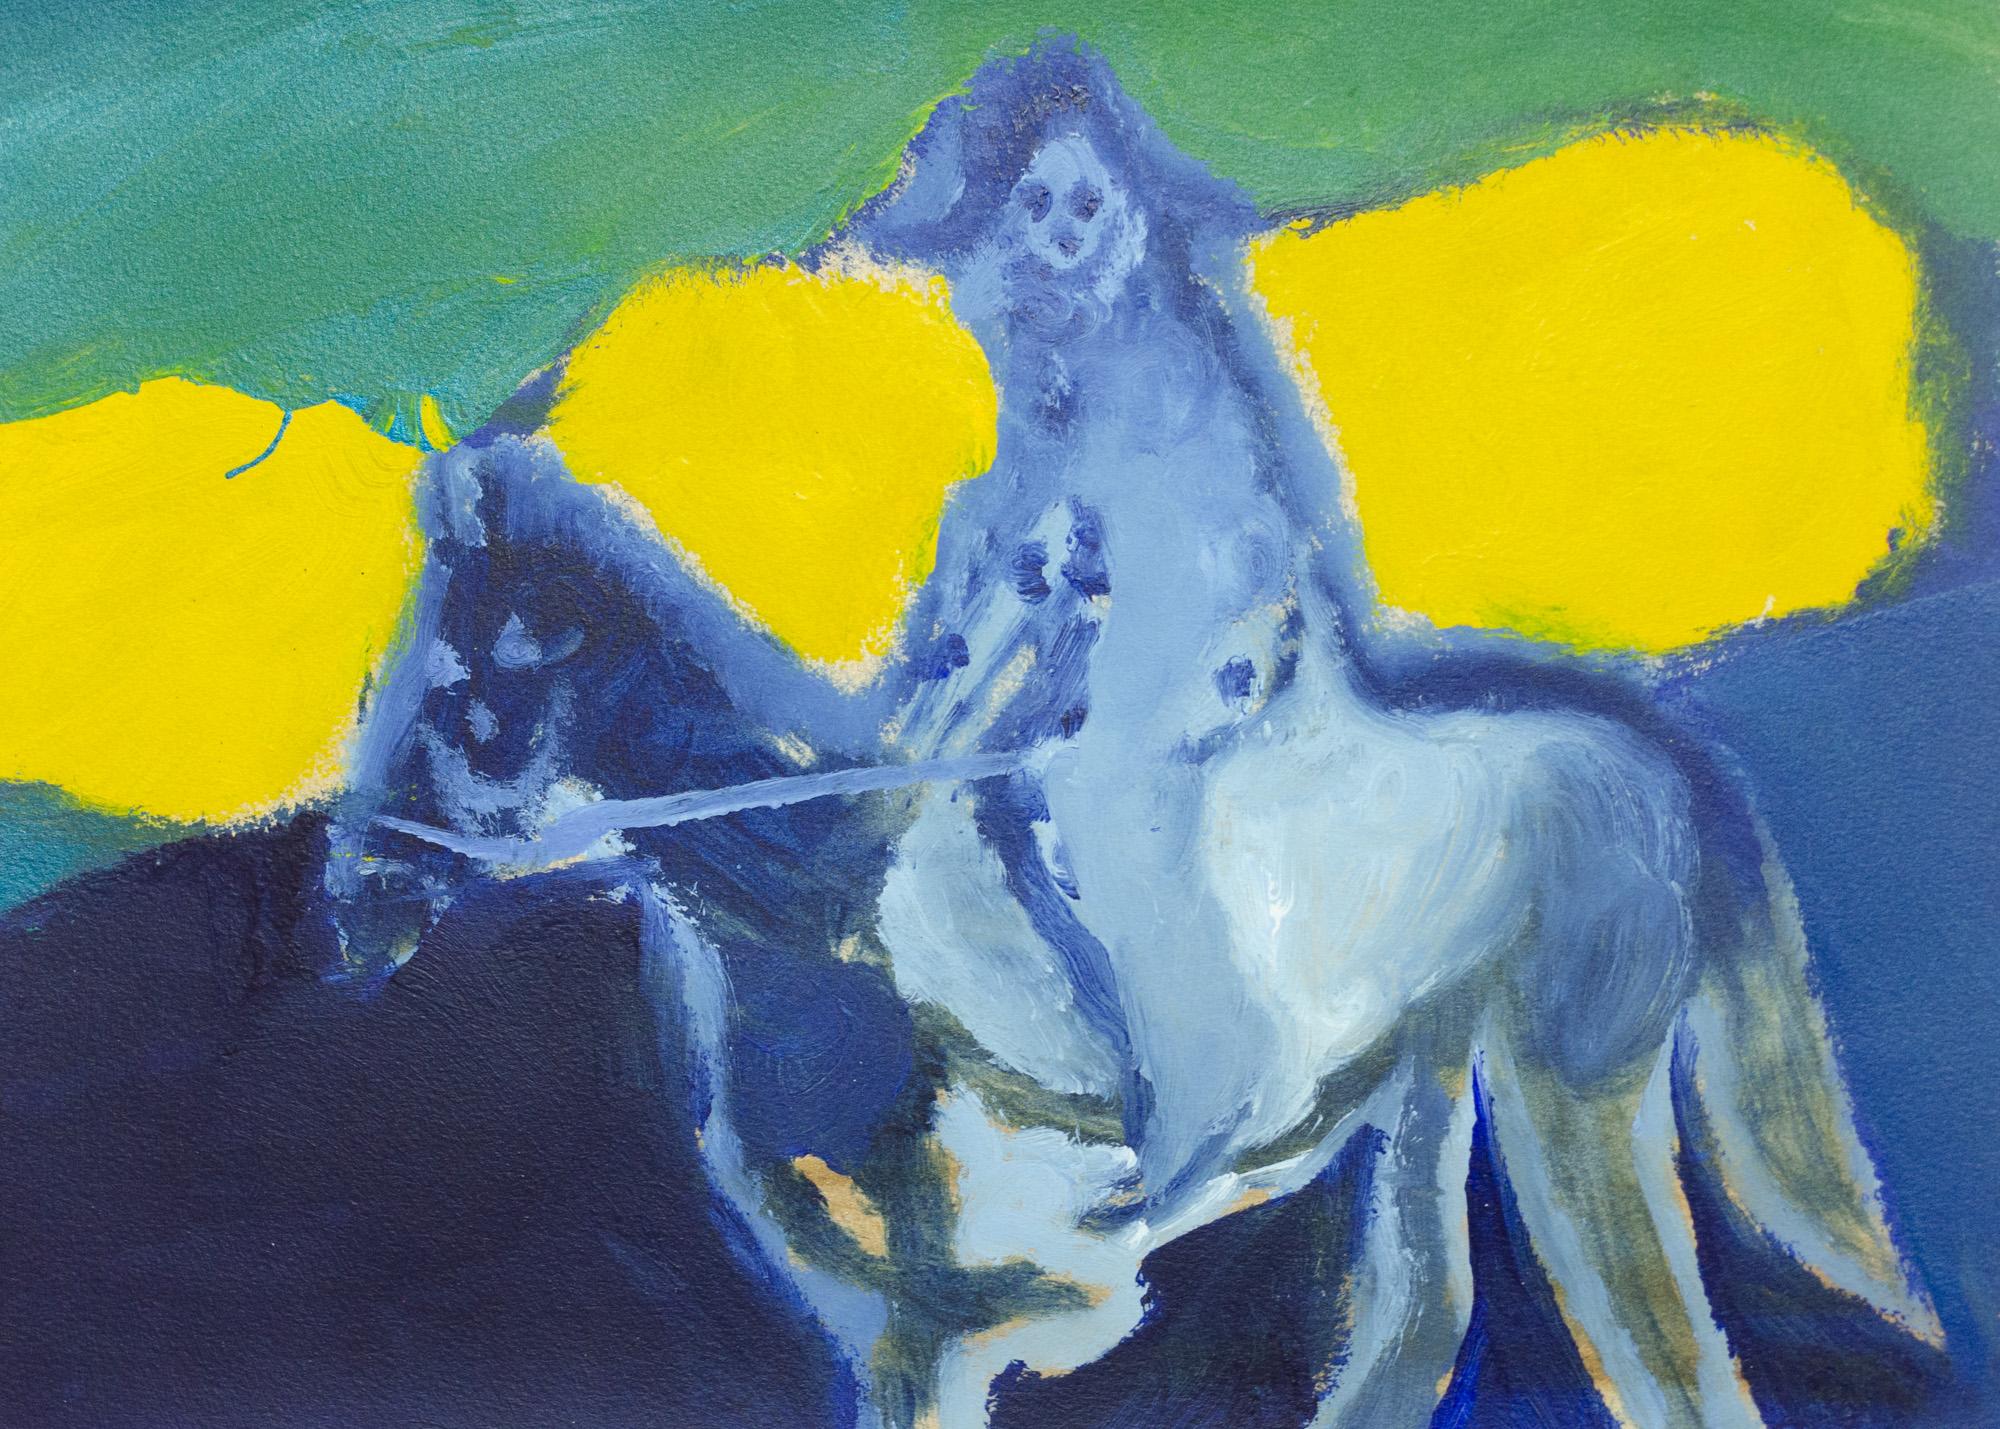 Rhys Lee, Riders, 2016, Acrylic on paper, 28 x 38cm, $700-1.jpg